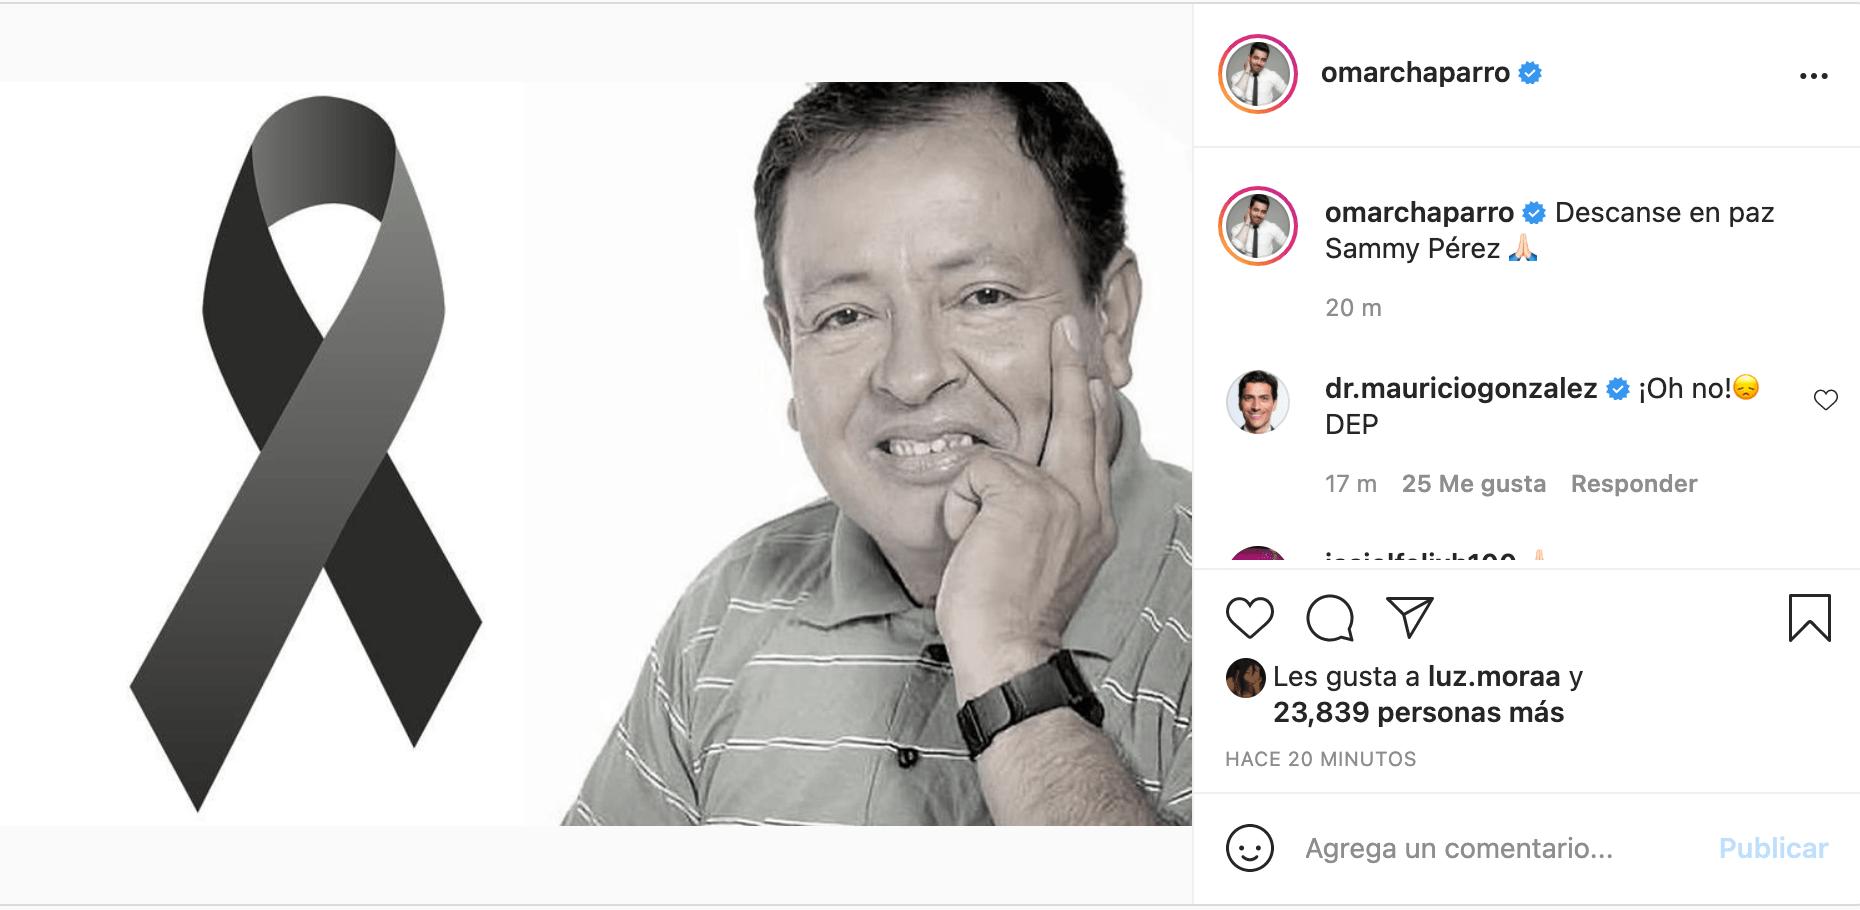 Adiós a un grande: Así reaccionó el internet ante la muerte de Sammy Pérez